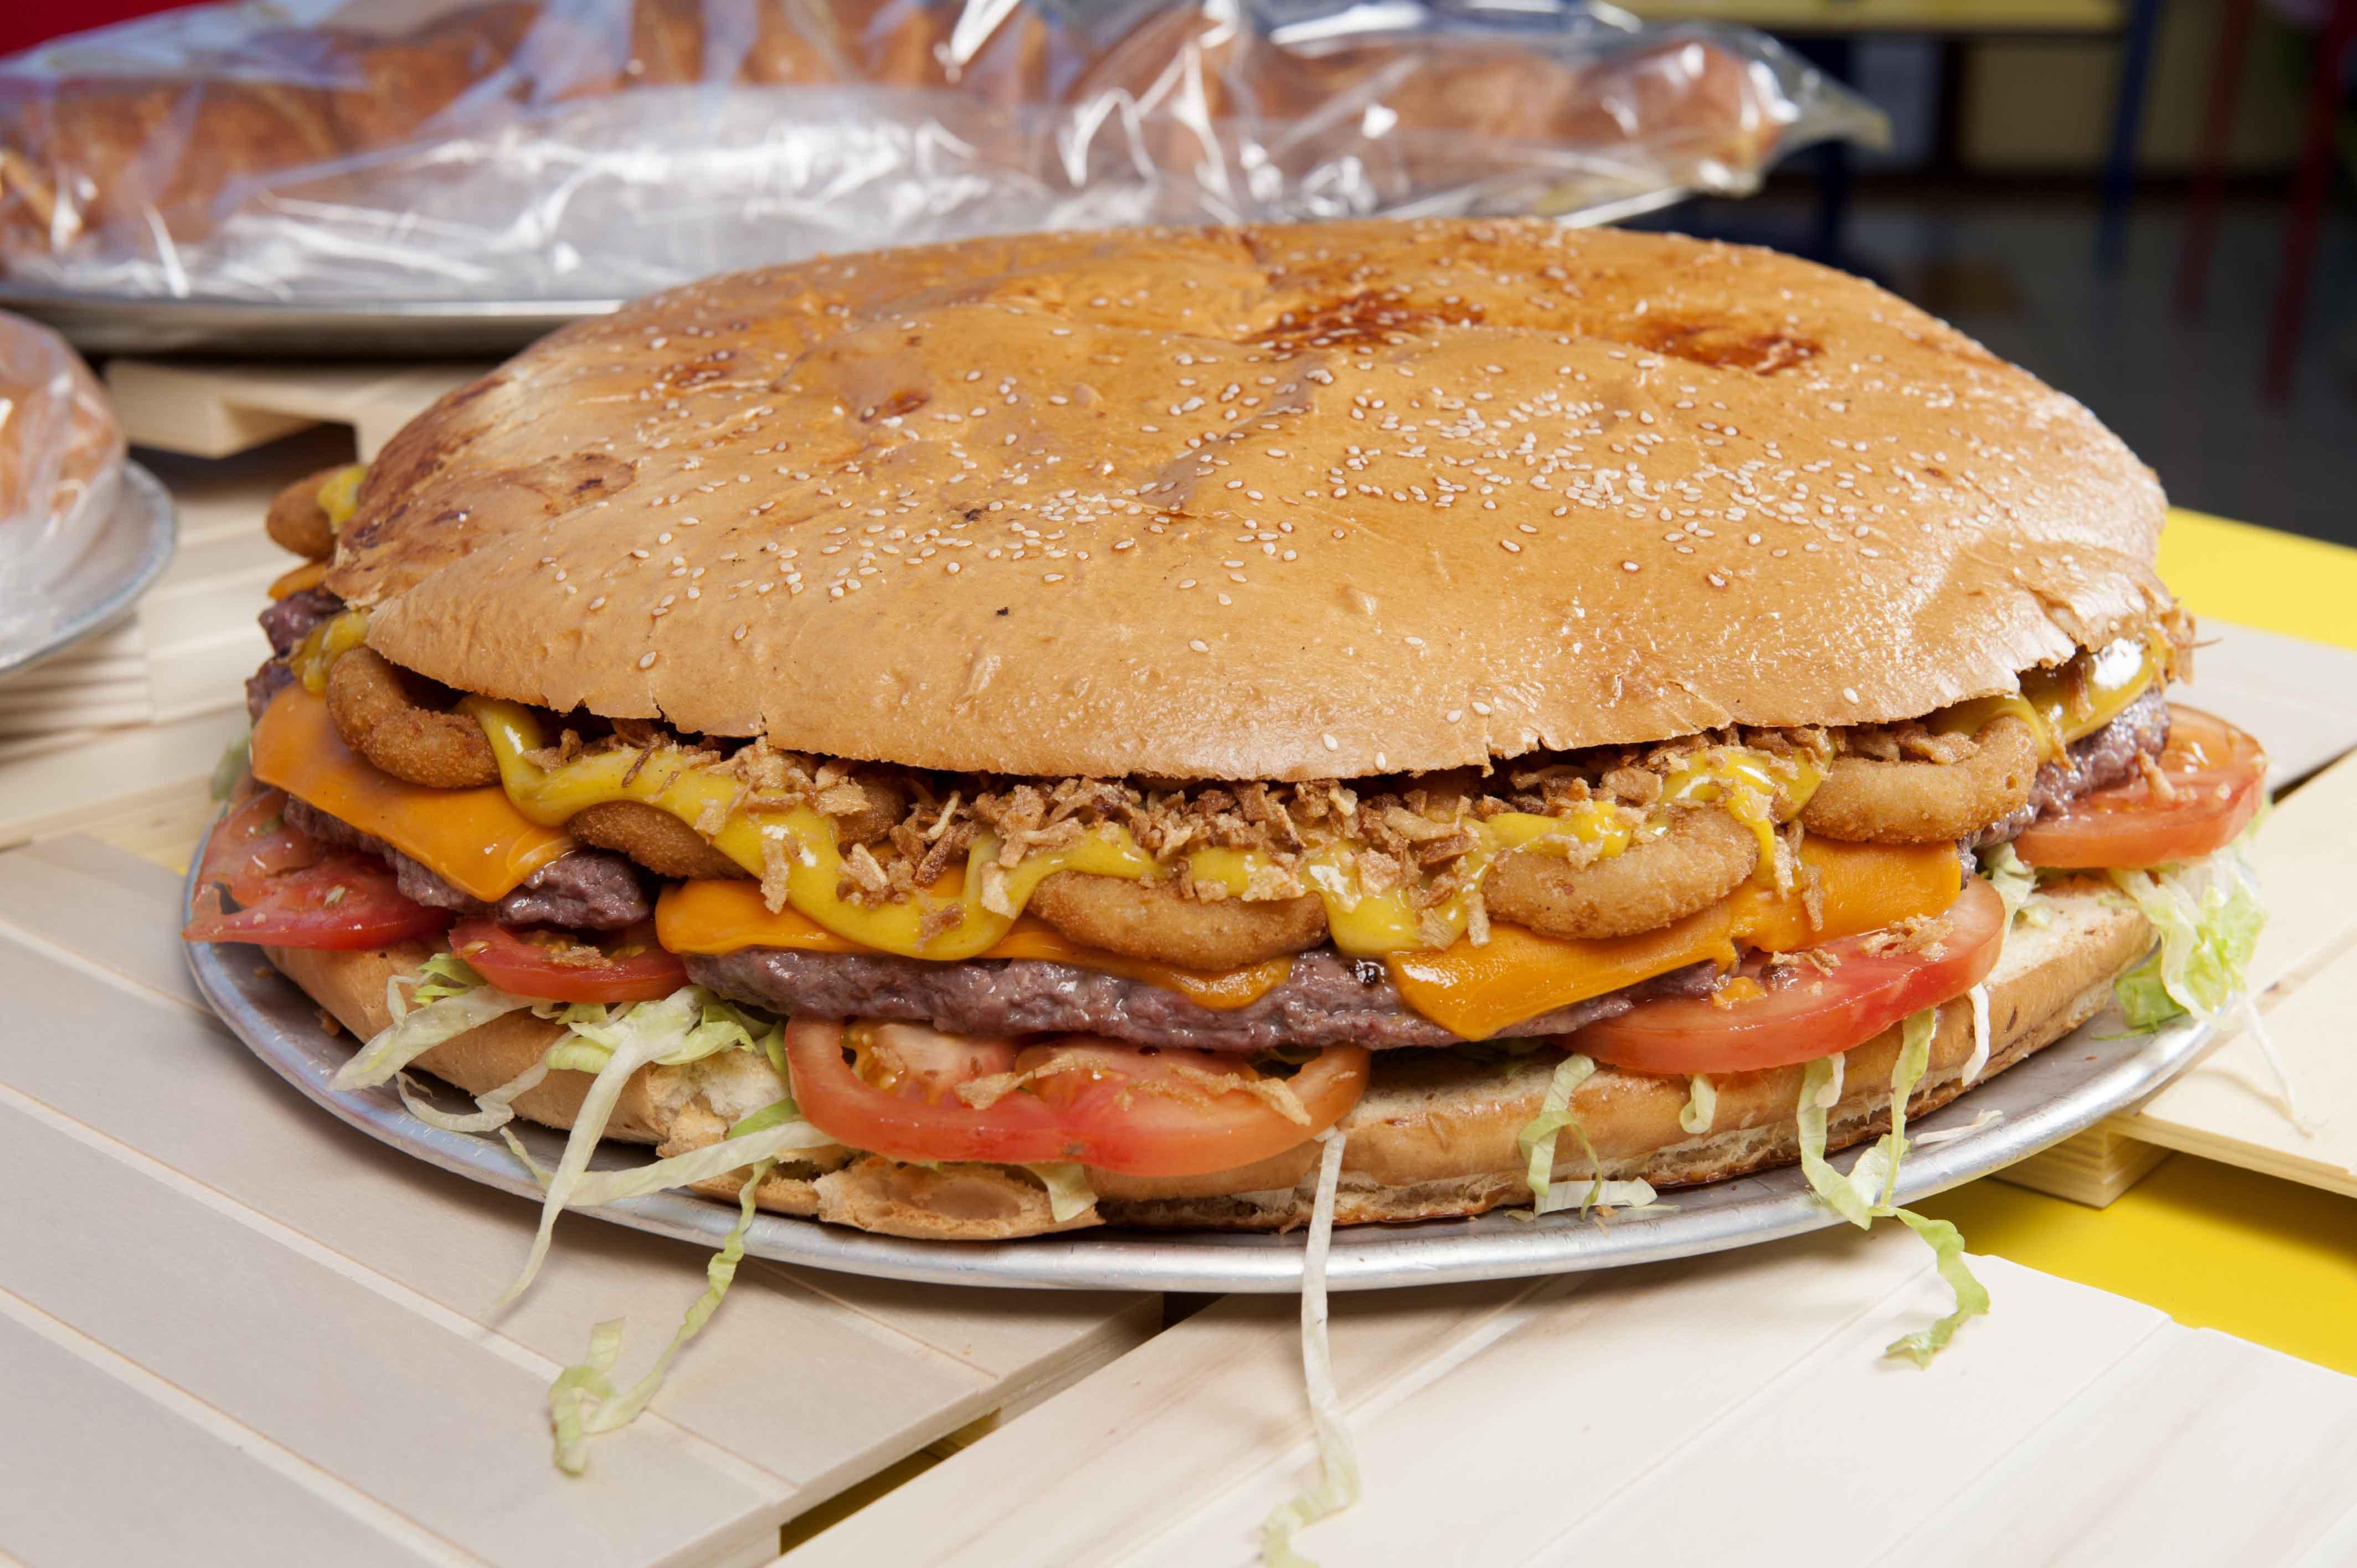 Crónicas carnívoras - hamburguesas gigantes